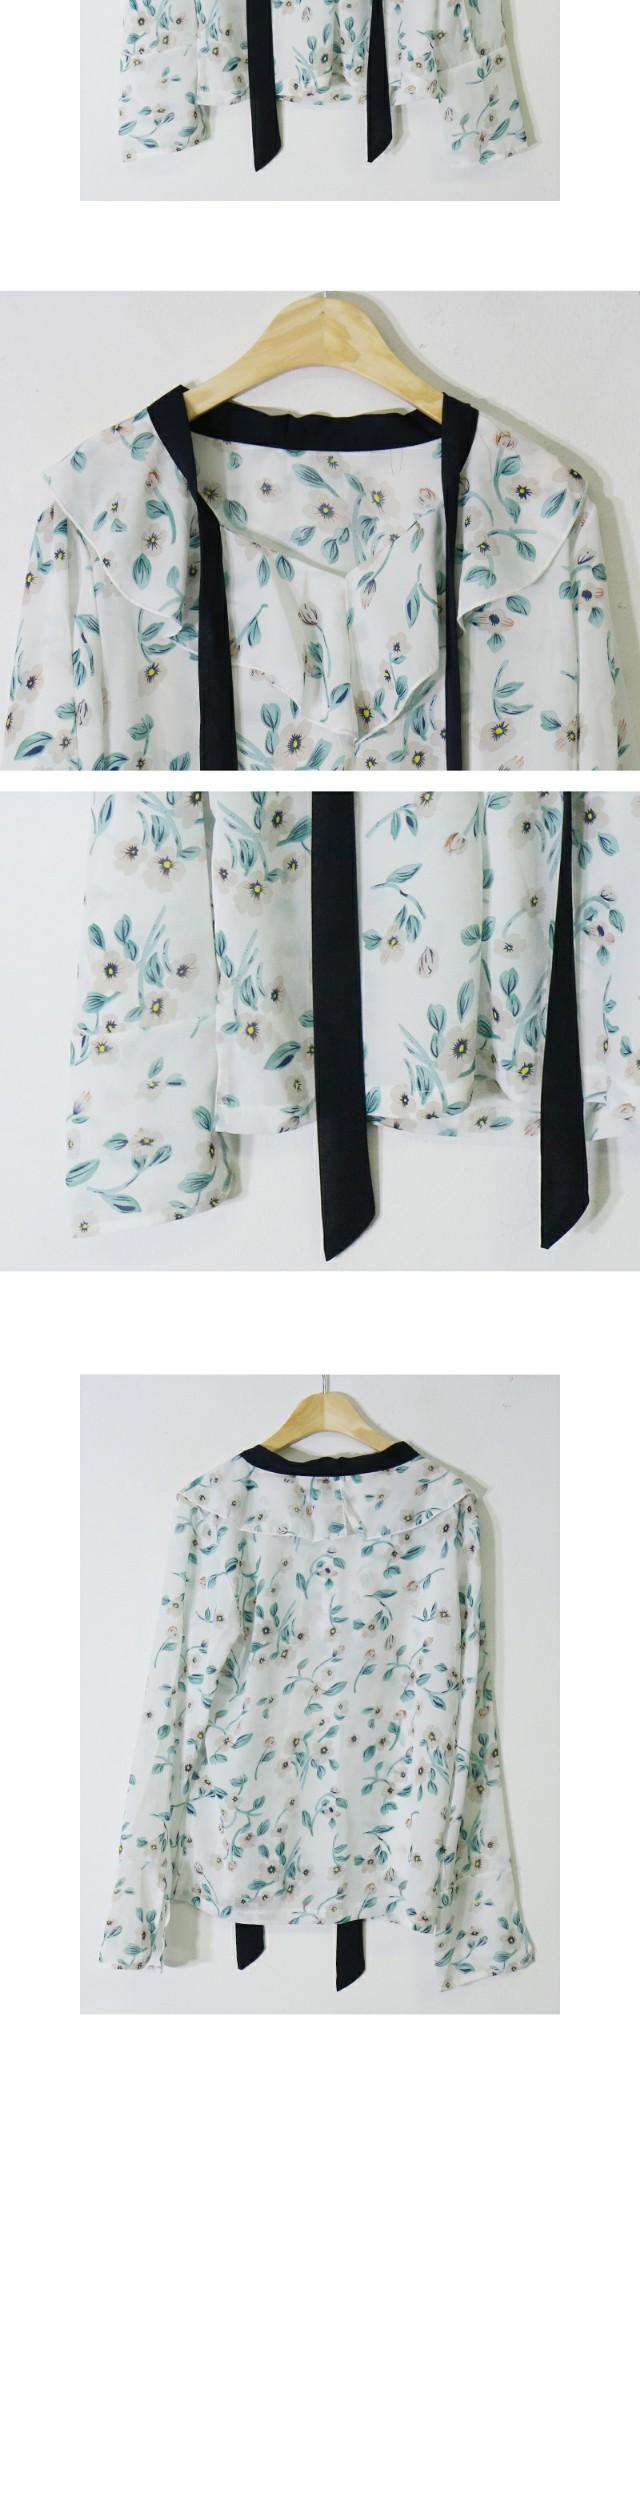 Specials ♥ Emerald Flower Blouse